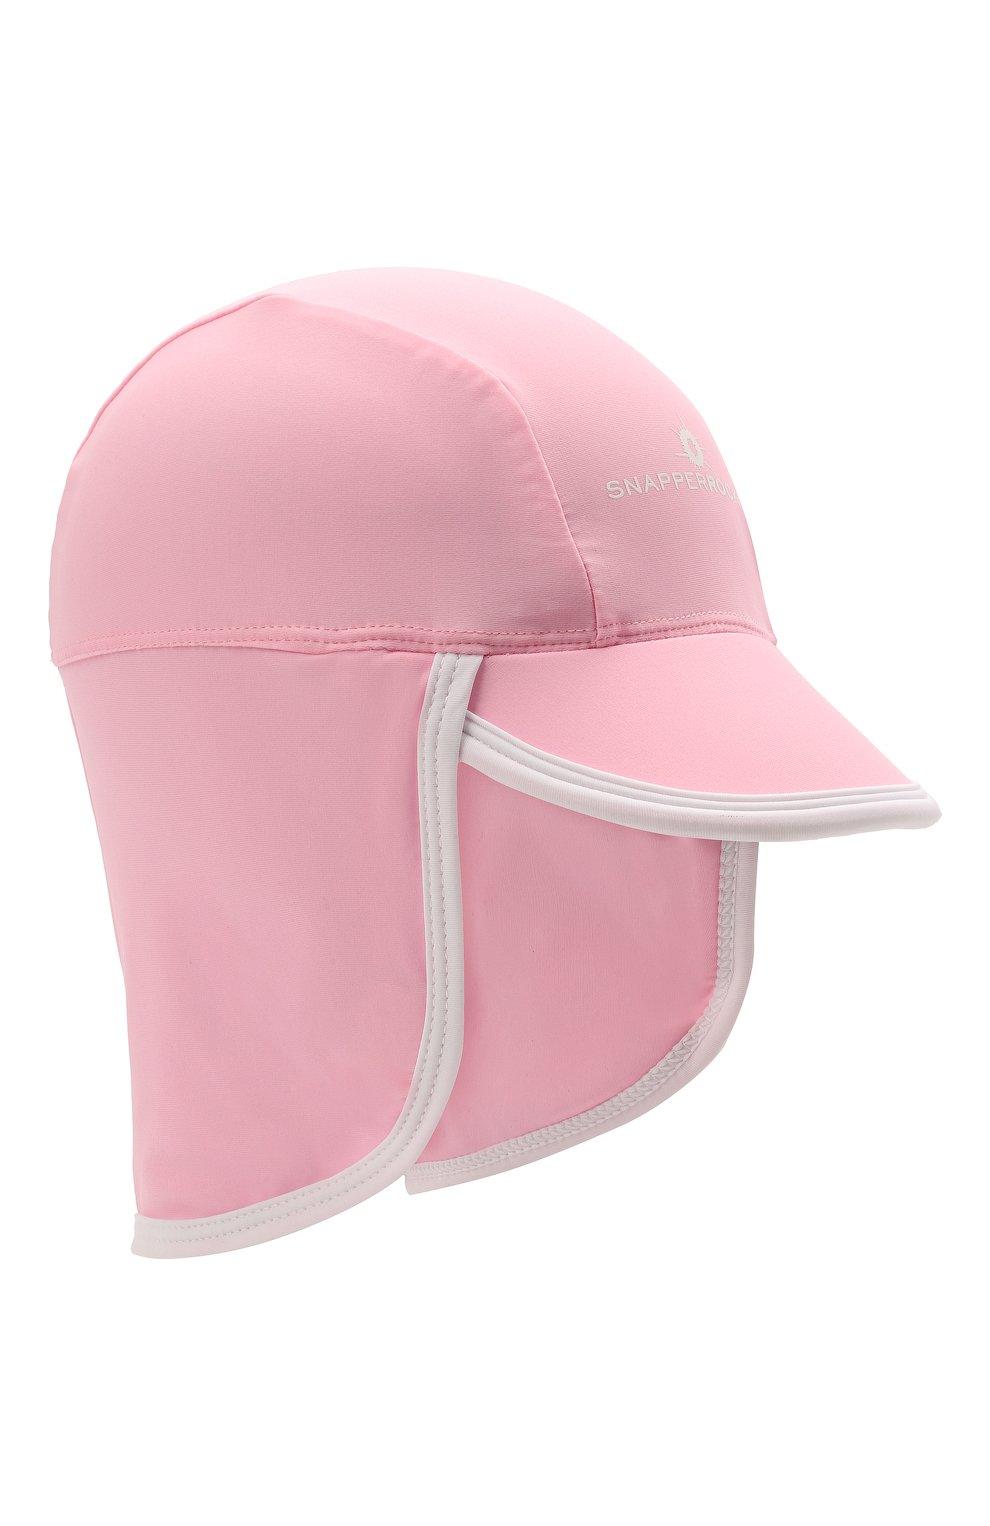 Детская кепка SNAPPER ROCK розового цвета, арт. 602 | Фото 1 (Материал: Текстиль)